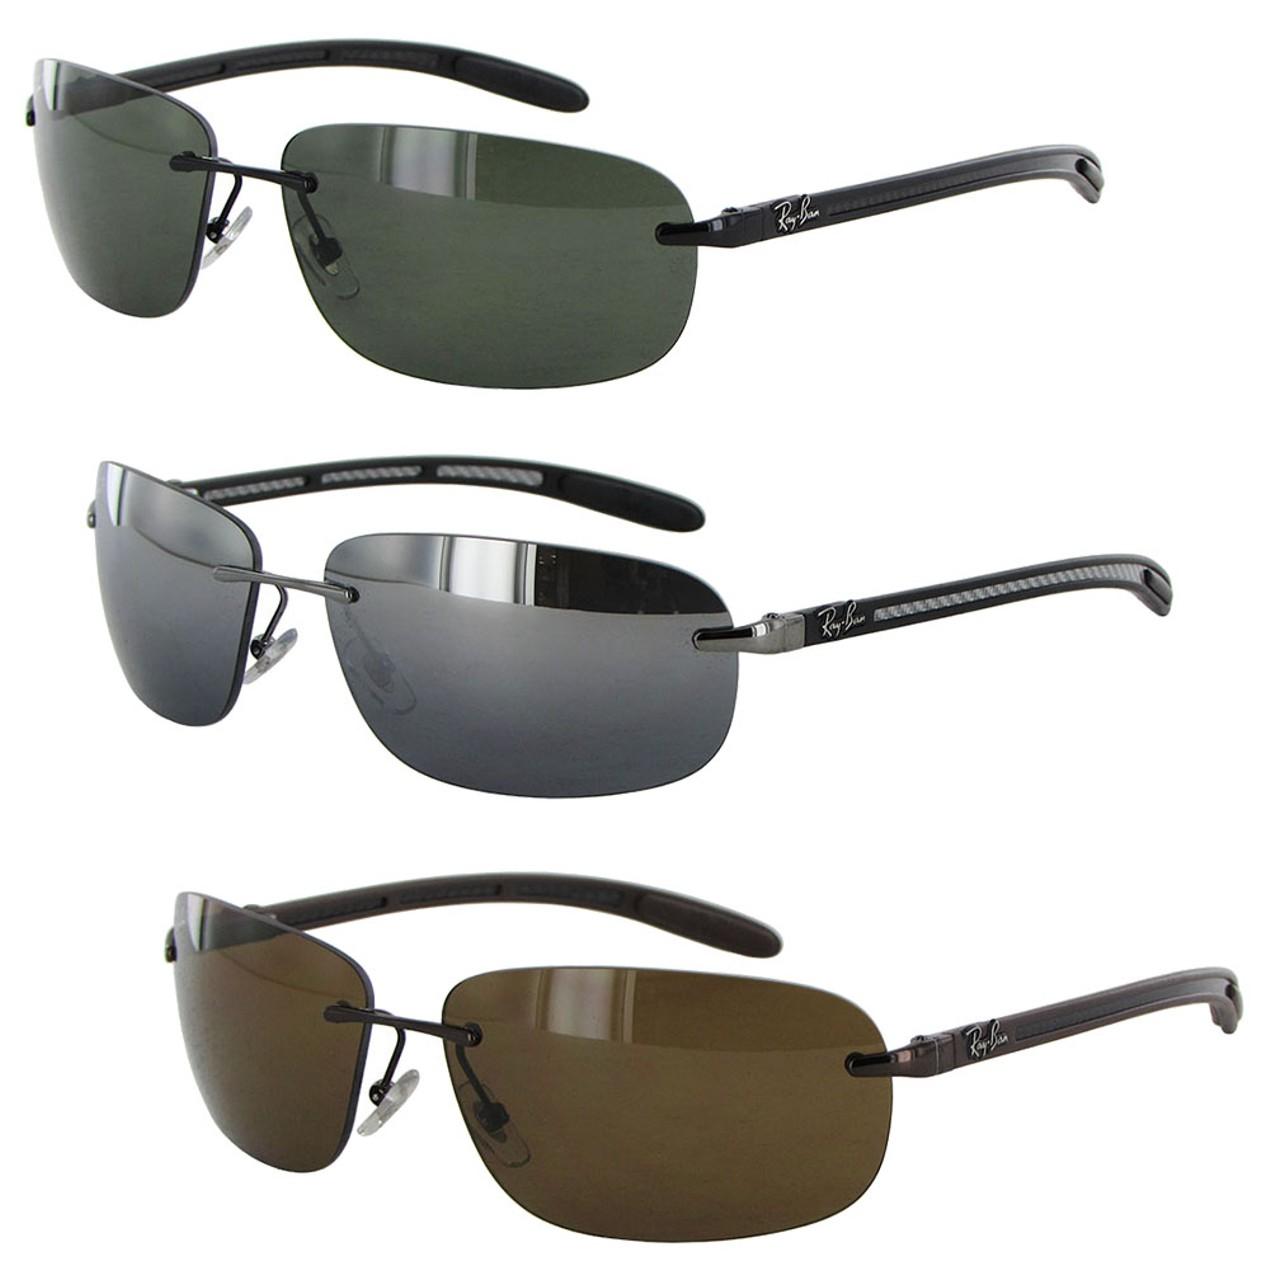 Ray Ban Tech Mens 8303 Carbon Fibre Rectangle Polarized Sunglasses ... 31b6fec37d78